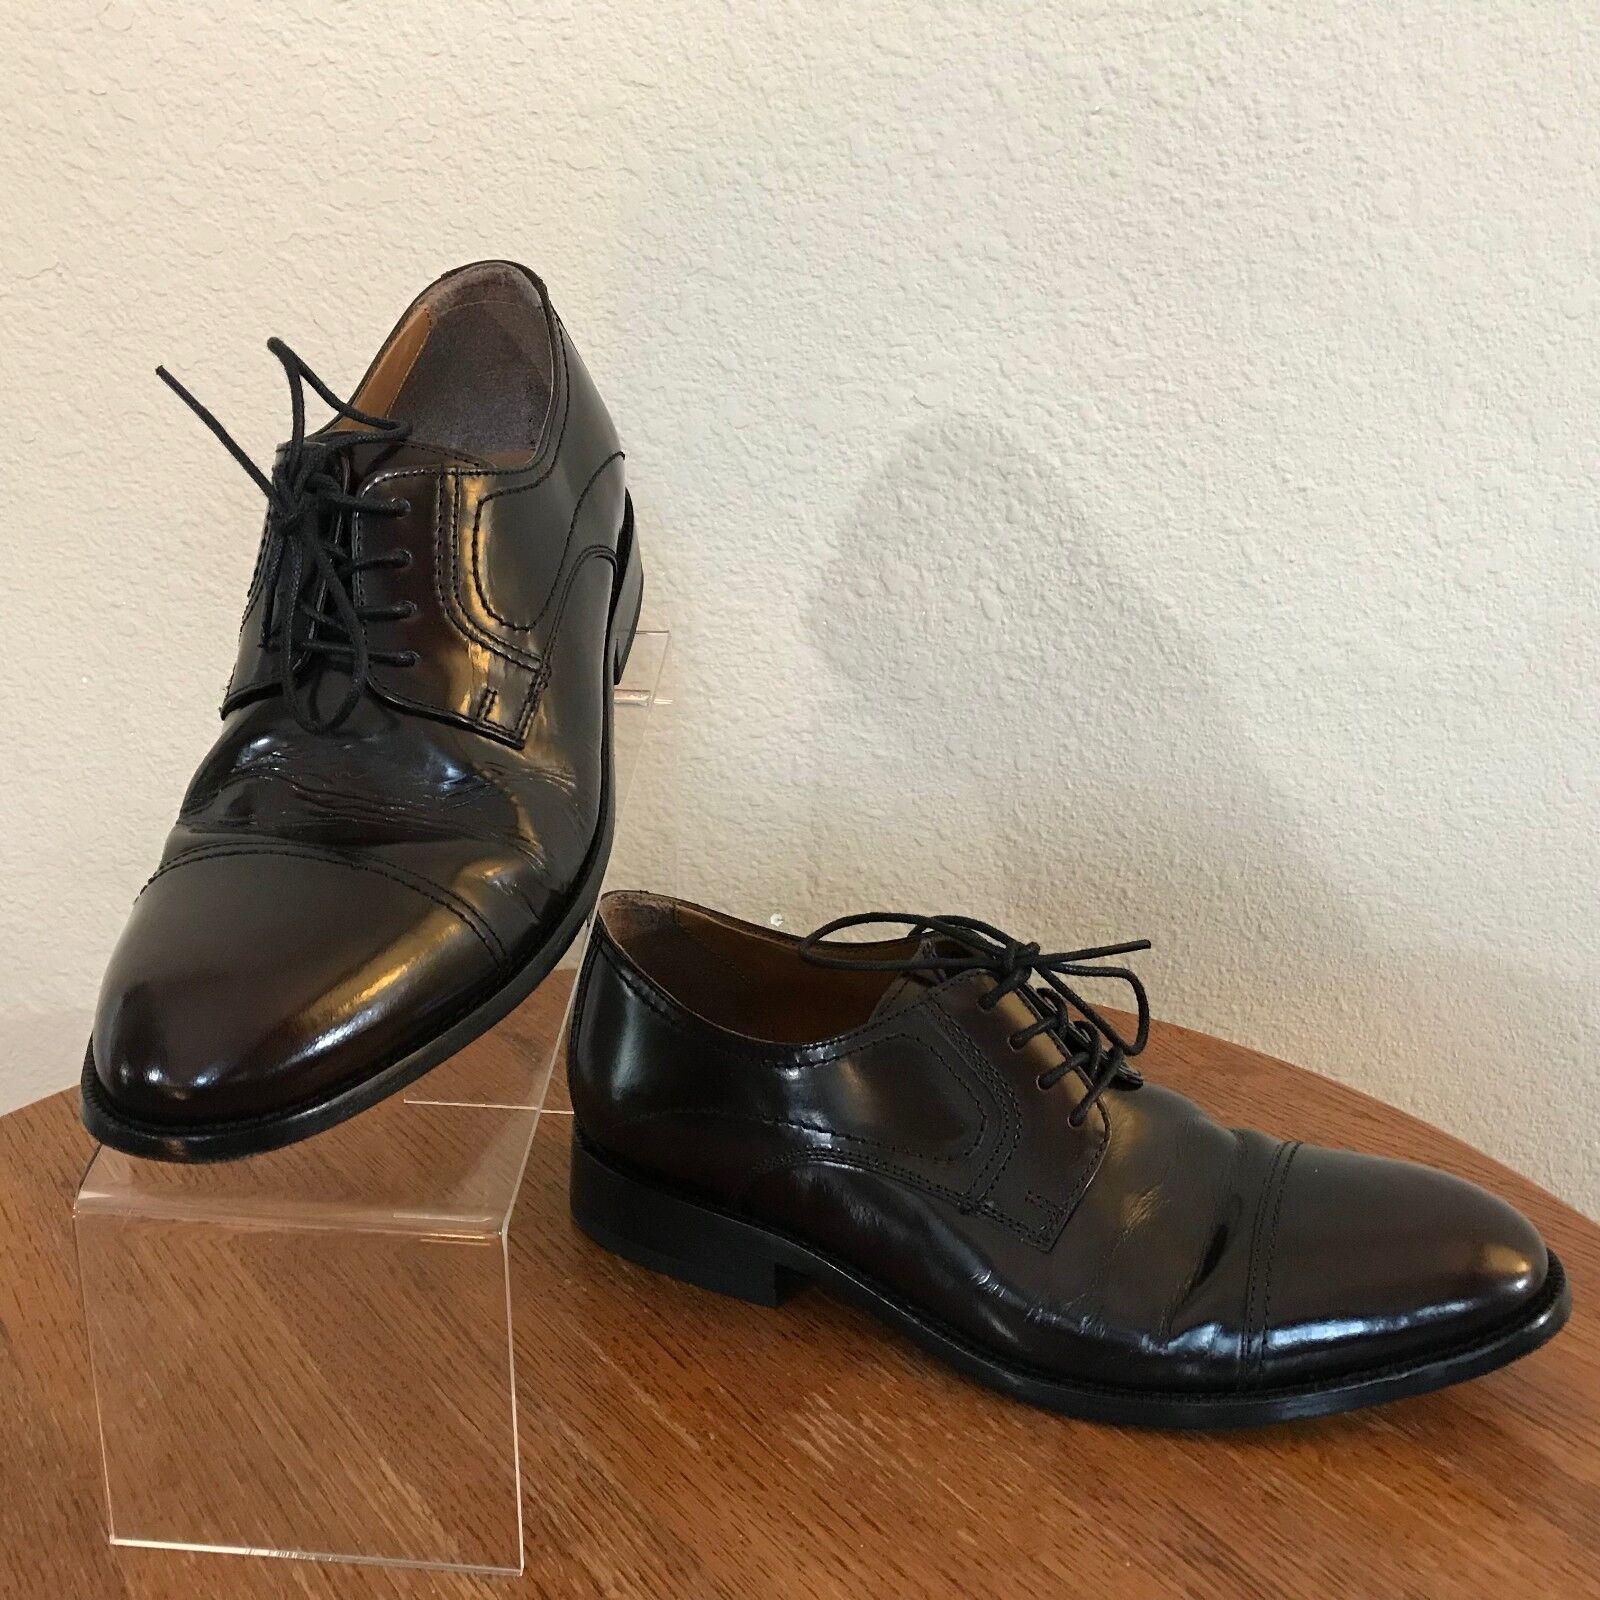 BOSTONIAN Mens Black Leather Cap Toe Dress (Medium) Shoes Size 9 D (Medium) Dress ed2ba0